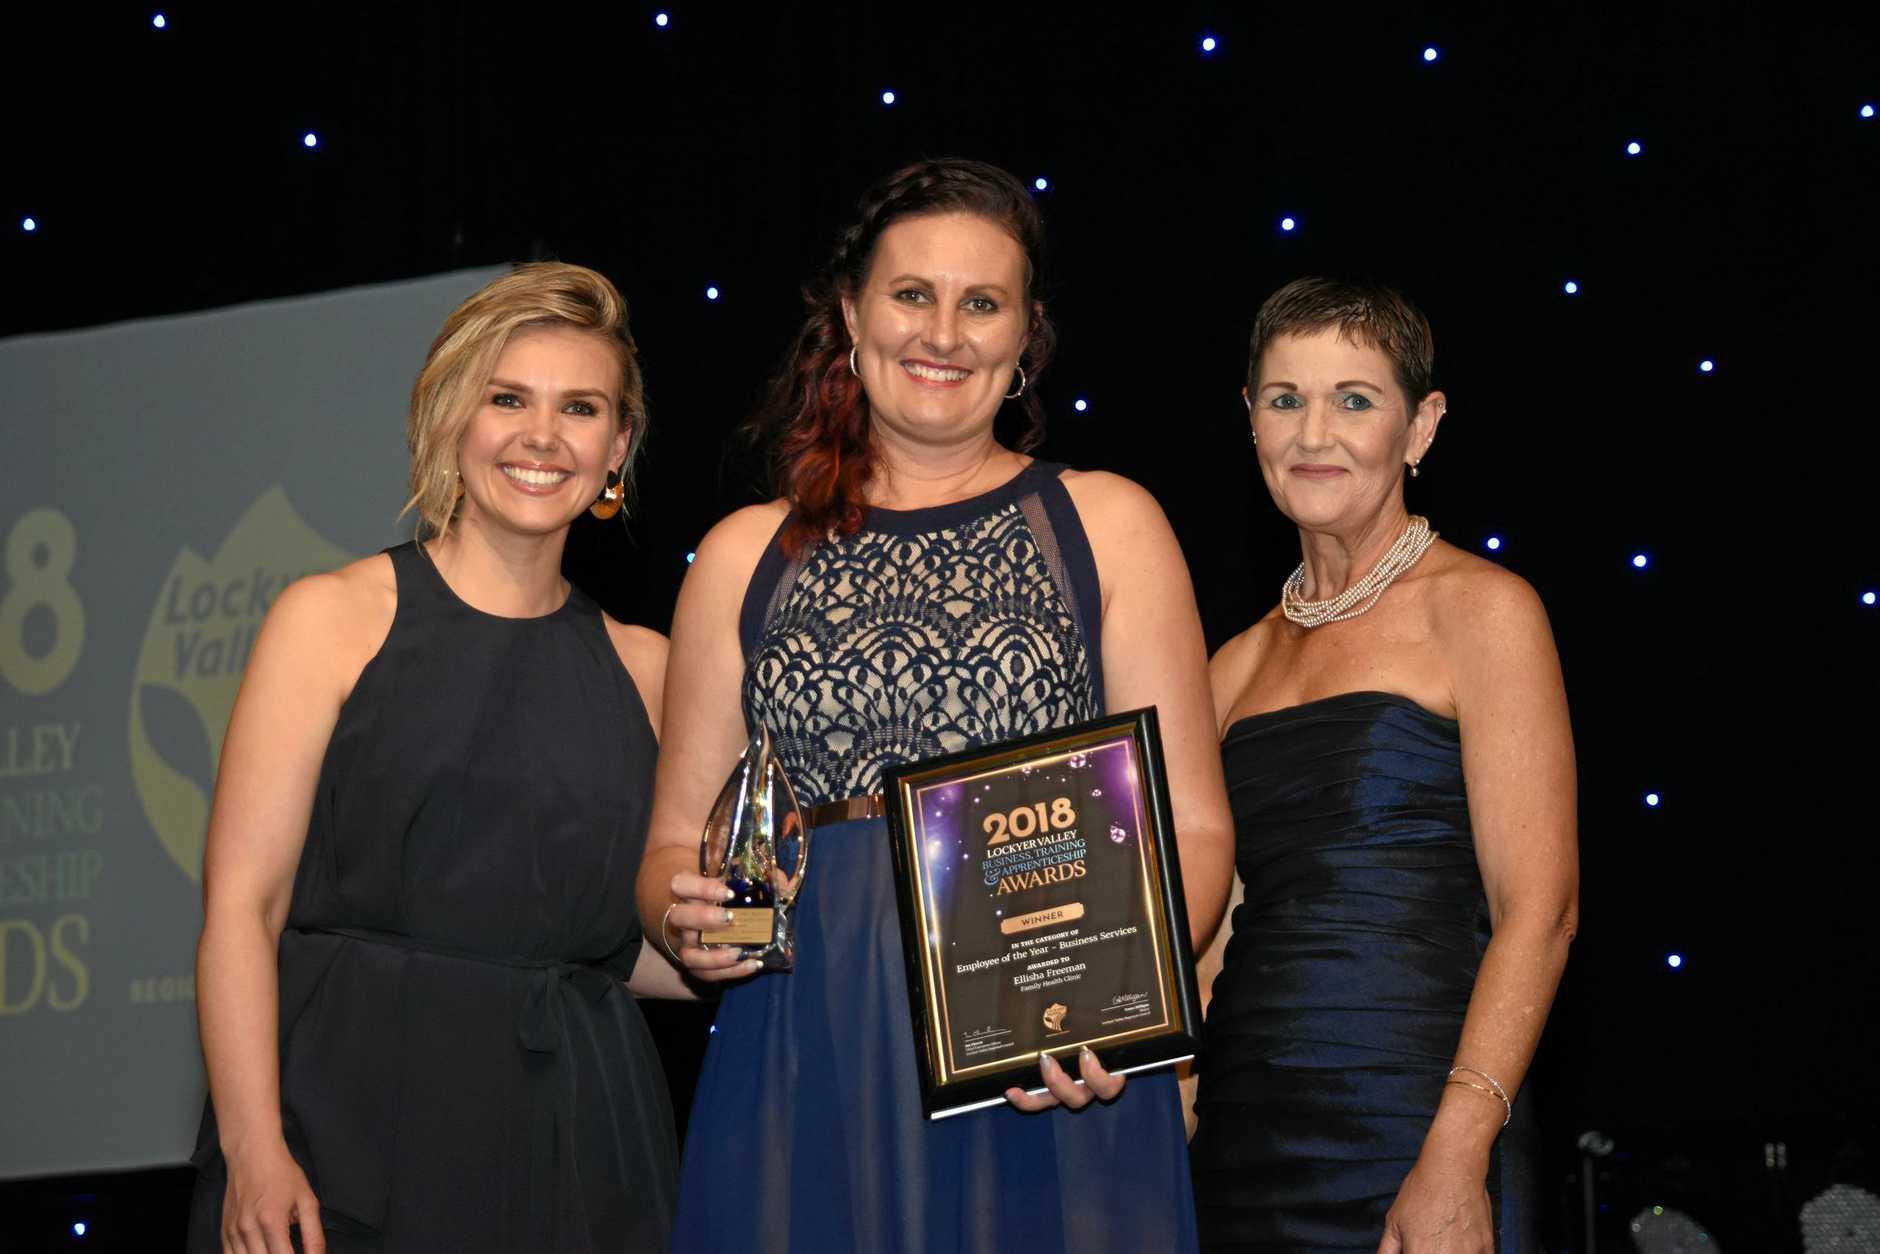 FLASHBACK: Employee of the year Ellisha Freeman (centre) with host Edwina Bartholomew and LVRC mayor Tanya Milligan, at the 2018 Lockyer Valley Business, Training and Apprenticeship Awards.